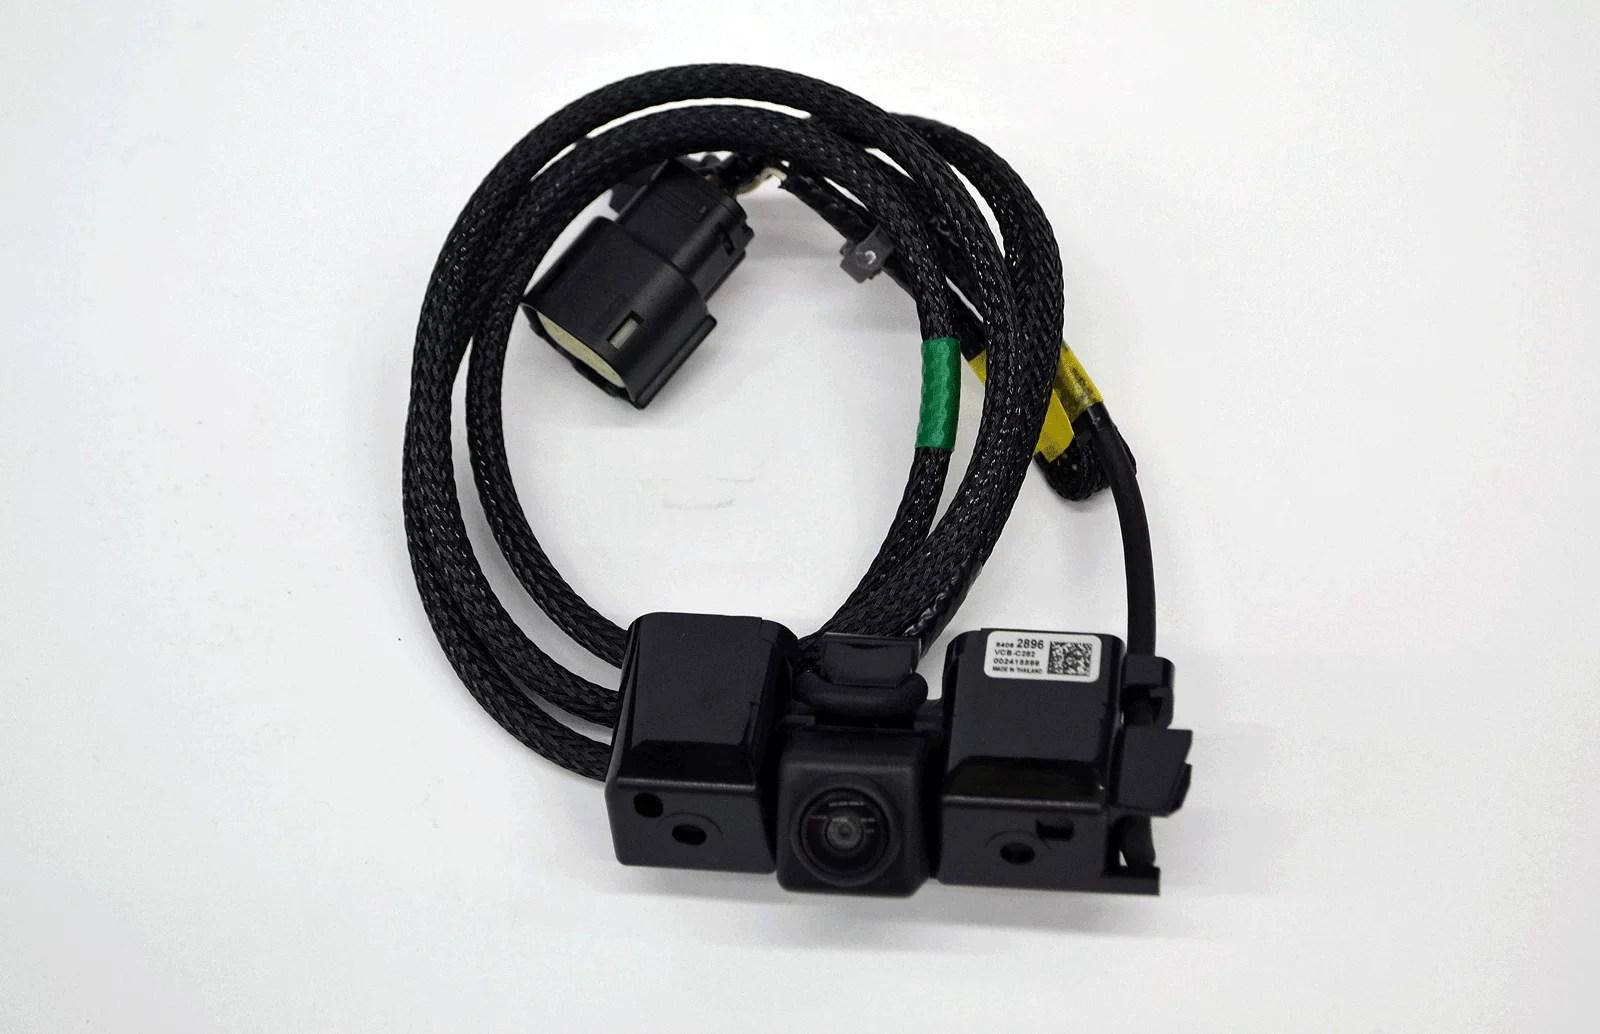 new gm oem rear view backup camera 2016 2017 silverado sierra ram backup camera wiring diagram wiring adapter backup camera 2017 sierra [ 1600 x 1034 Pixel ]